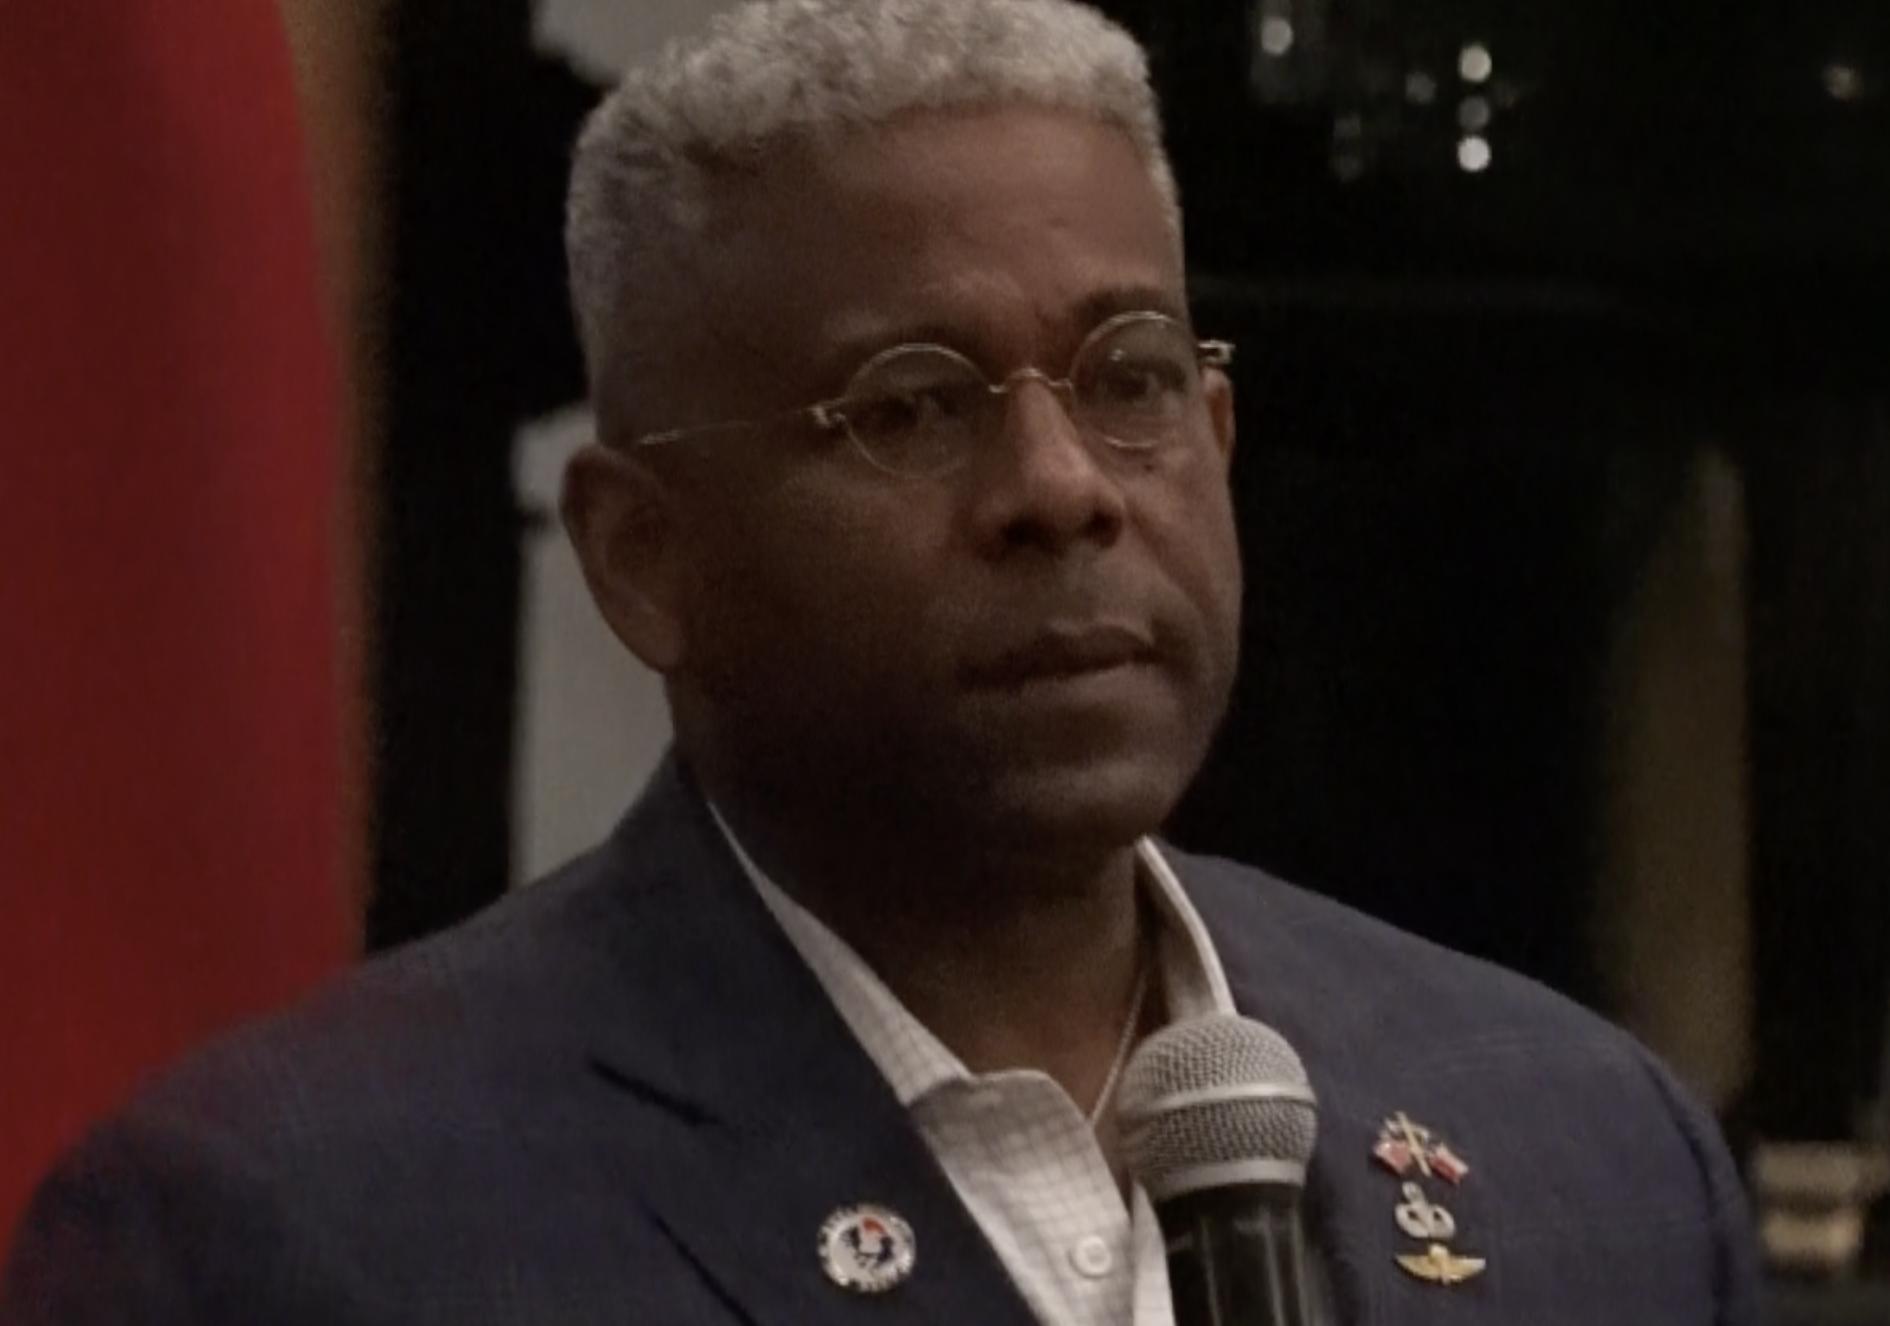 JUICE – Florida Politics' Juicy Read -9.8.20 – Allen West: 'Black Lives Matter' is 'Crap' – Biden's Makeover – 2012 Obama vs. 2020 Biden – Democrats Fail to Denounce Violence